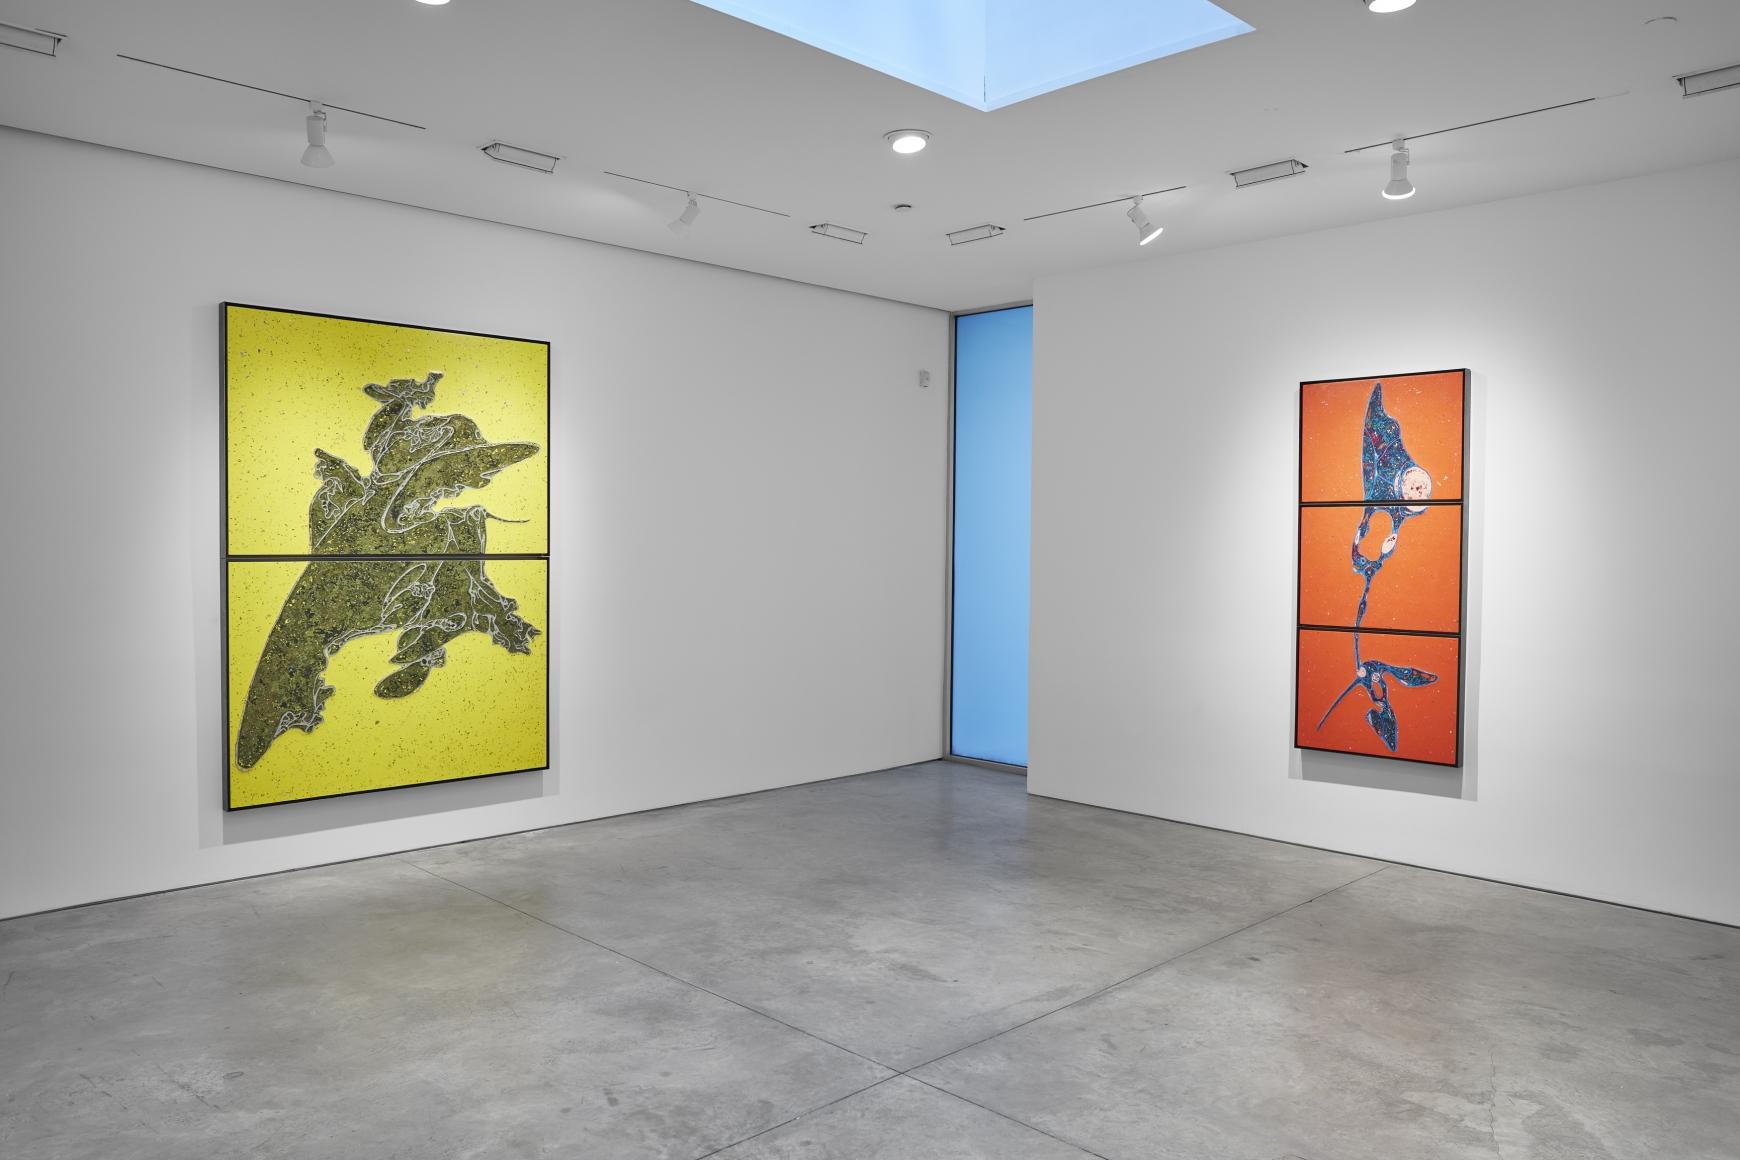 Lee Bul, Interlude: Perdu Installation view 7